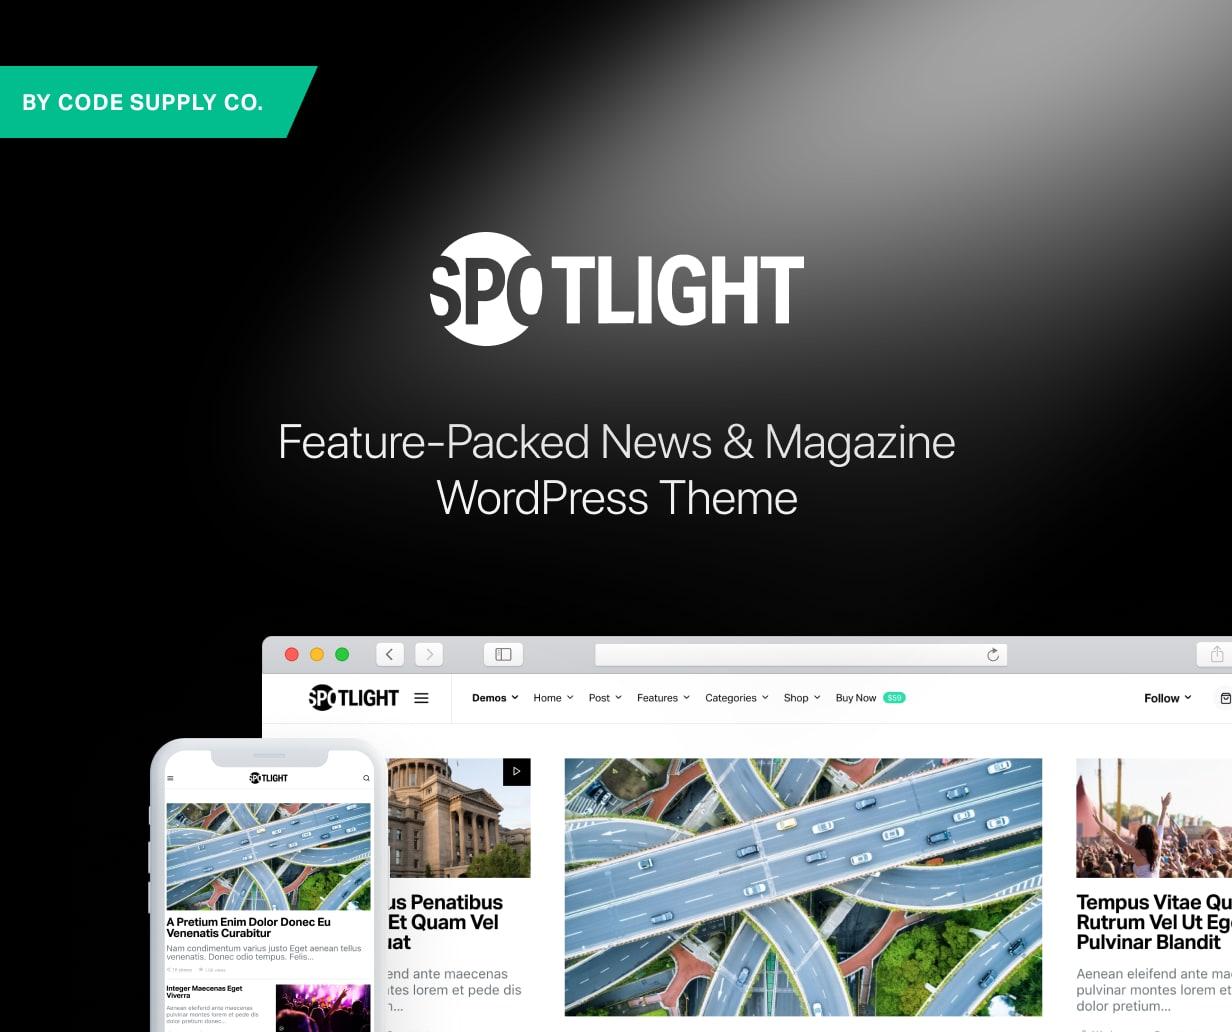 Spotlight - Feature-Packed News & Magazine WordPress Theme - 1